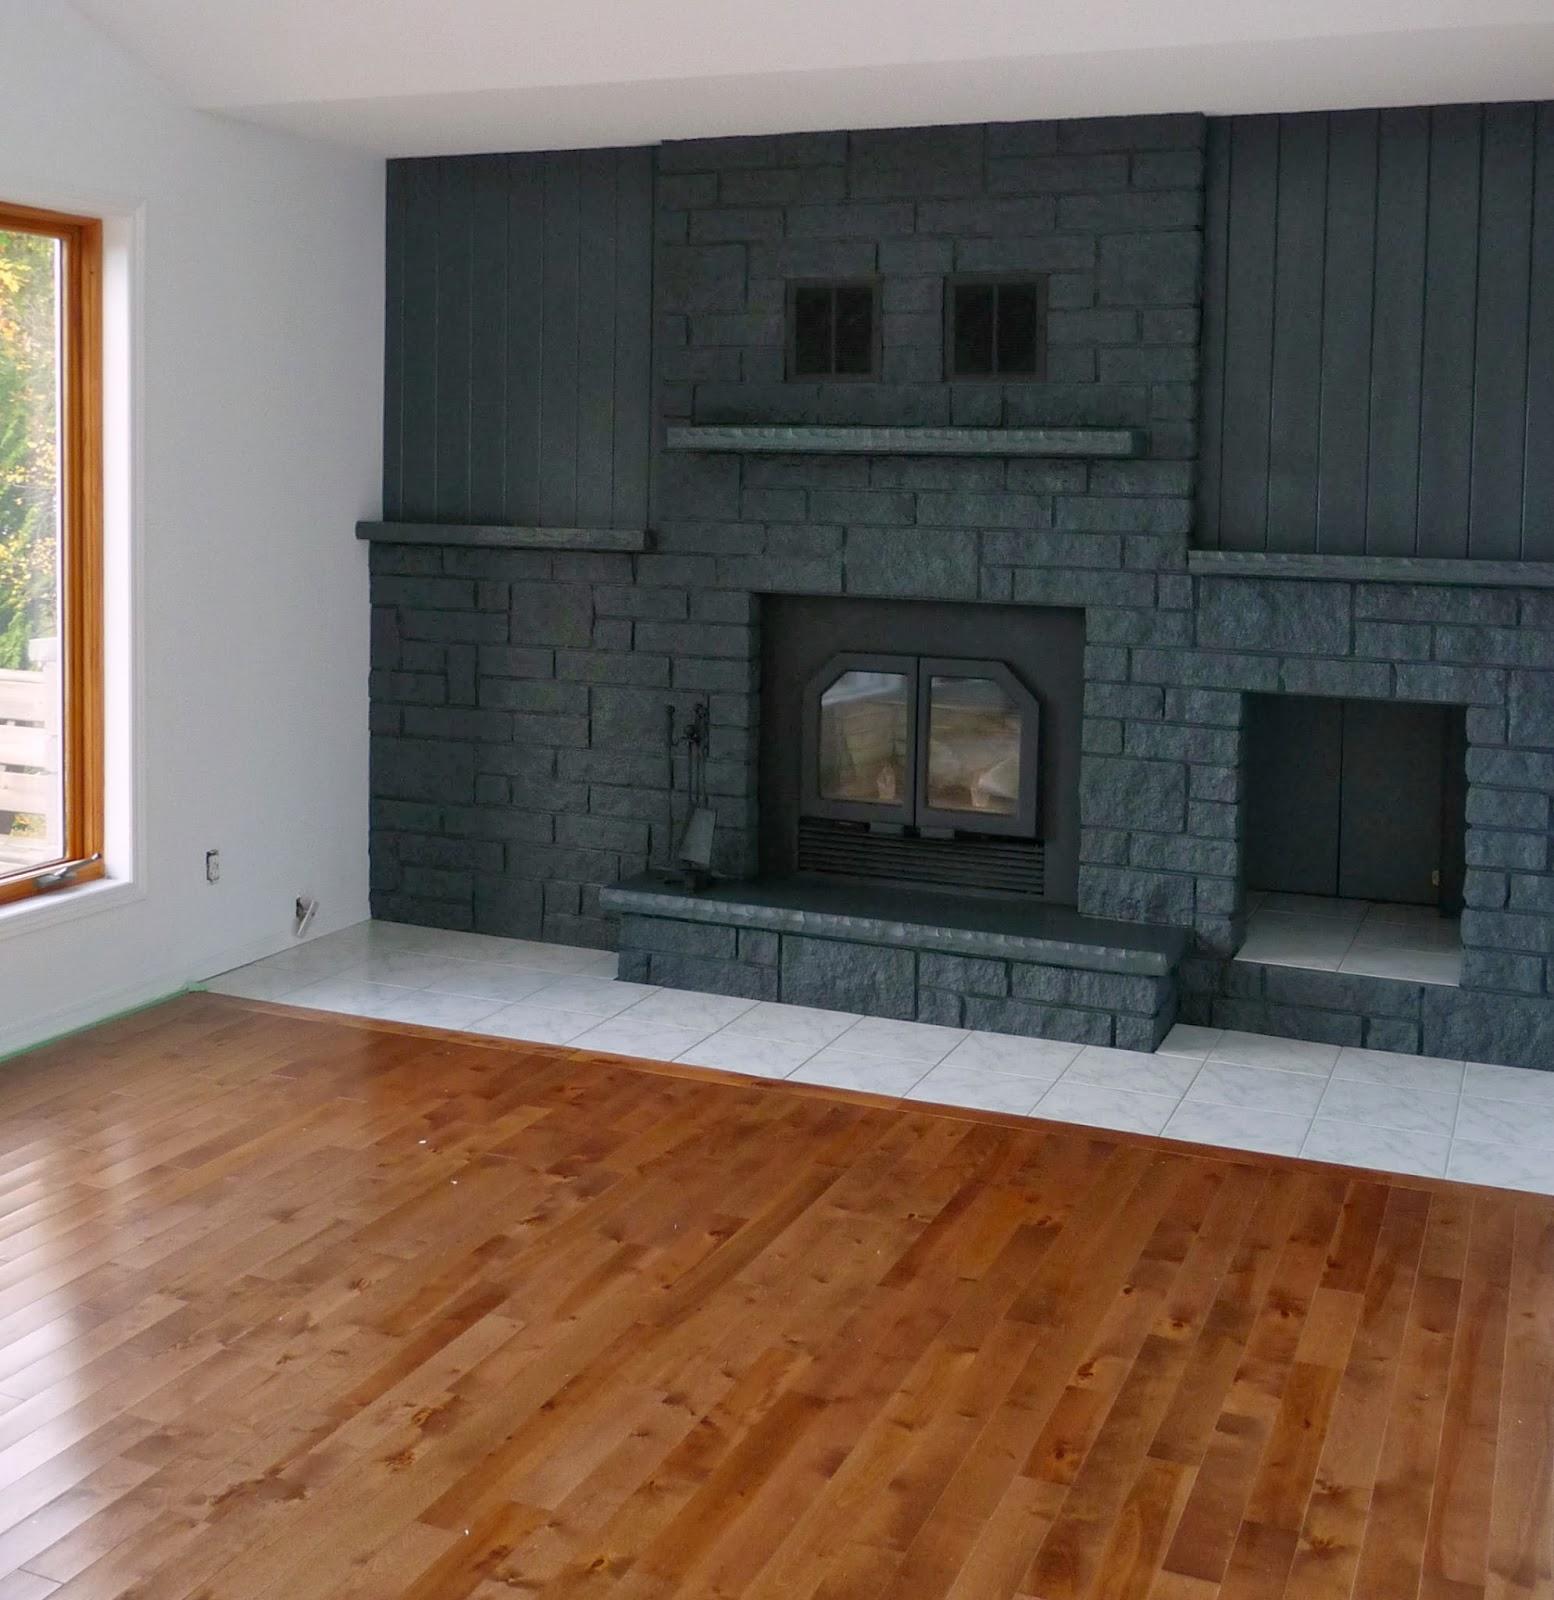 Dark grey fireplace, warm wood floors